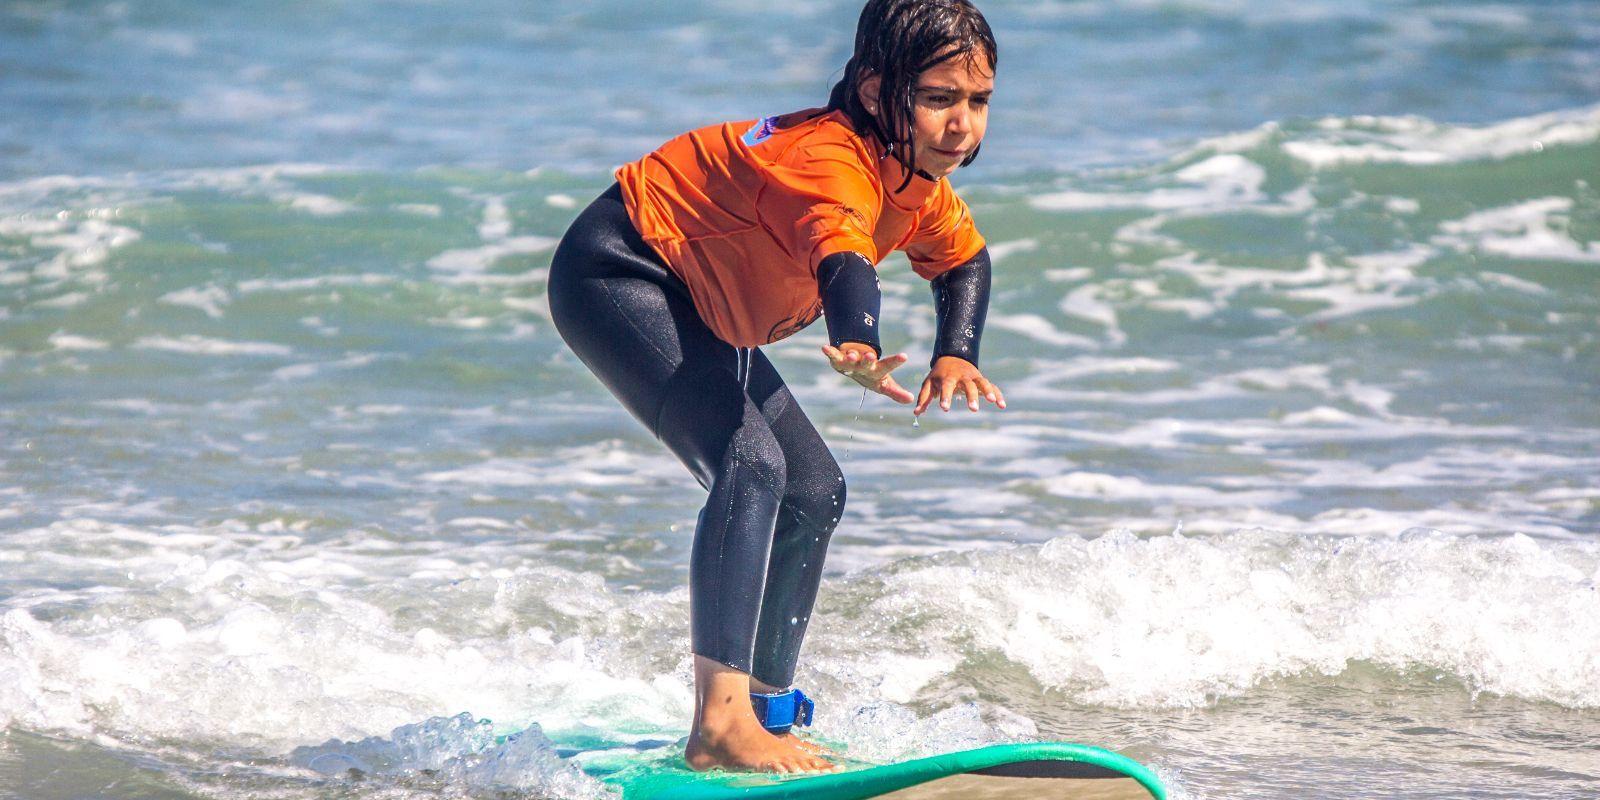 Niña sobre tabla de surf